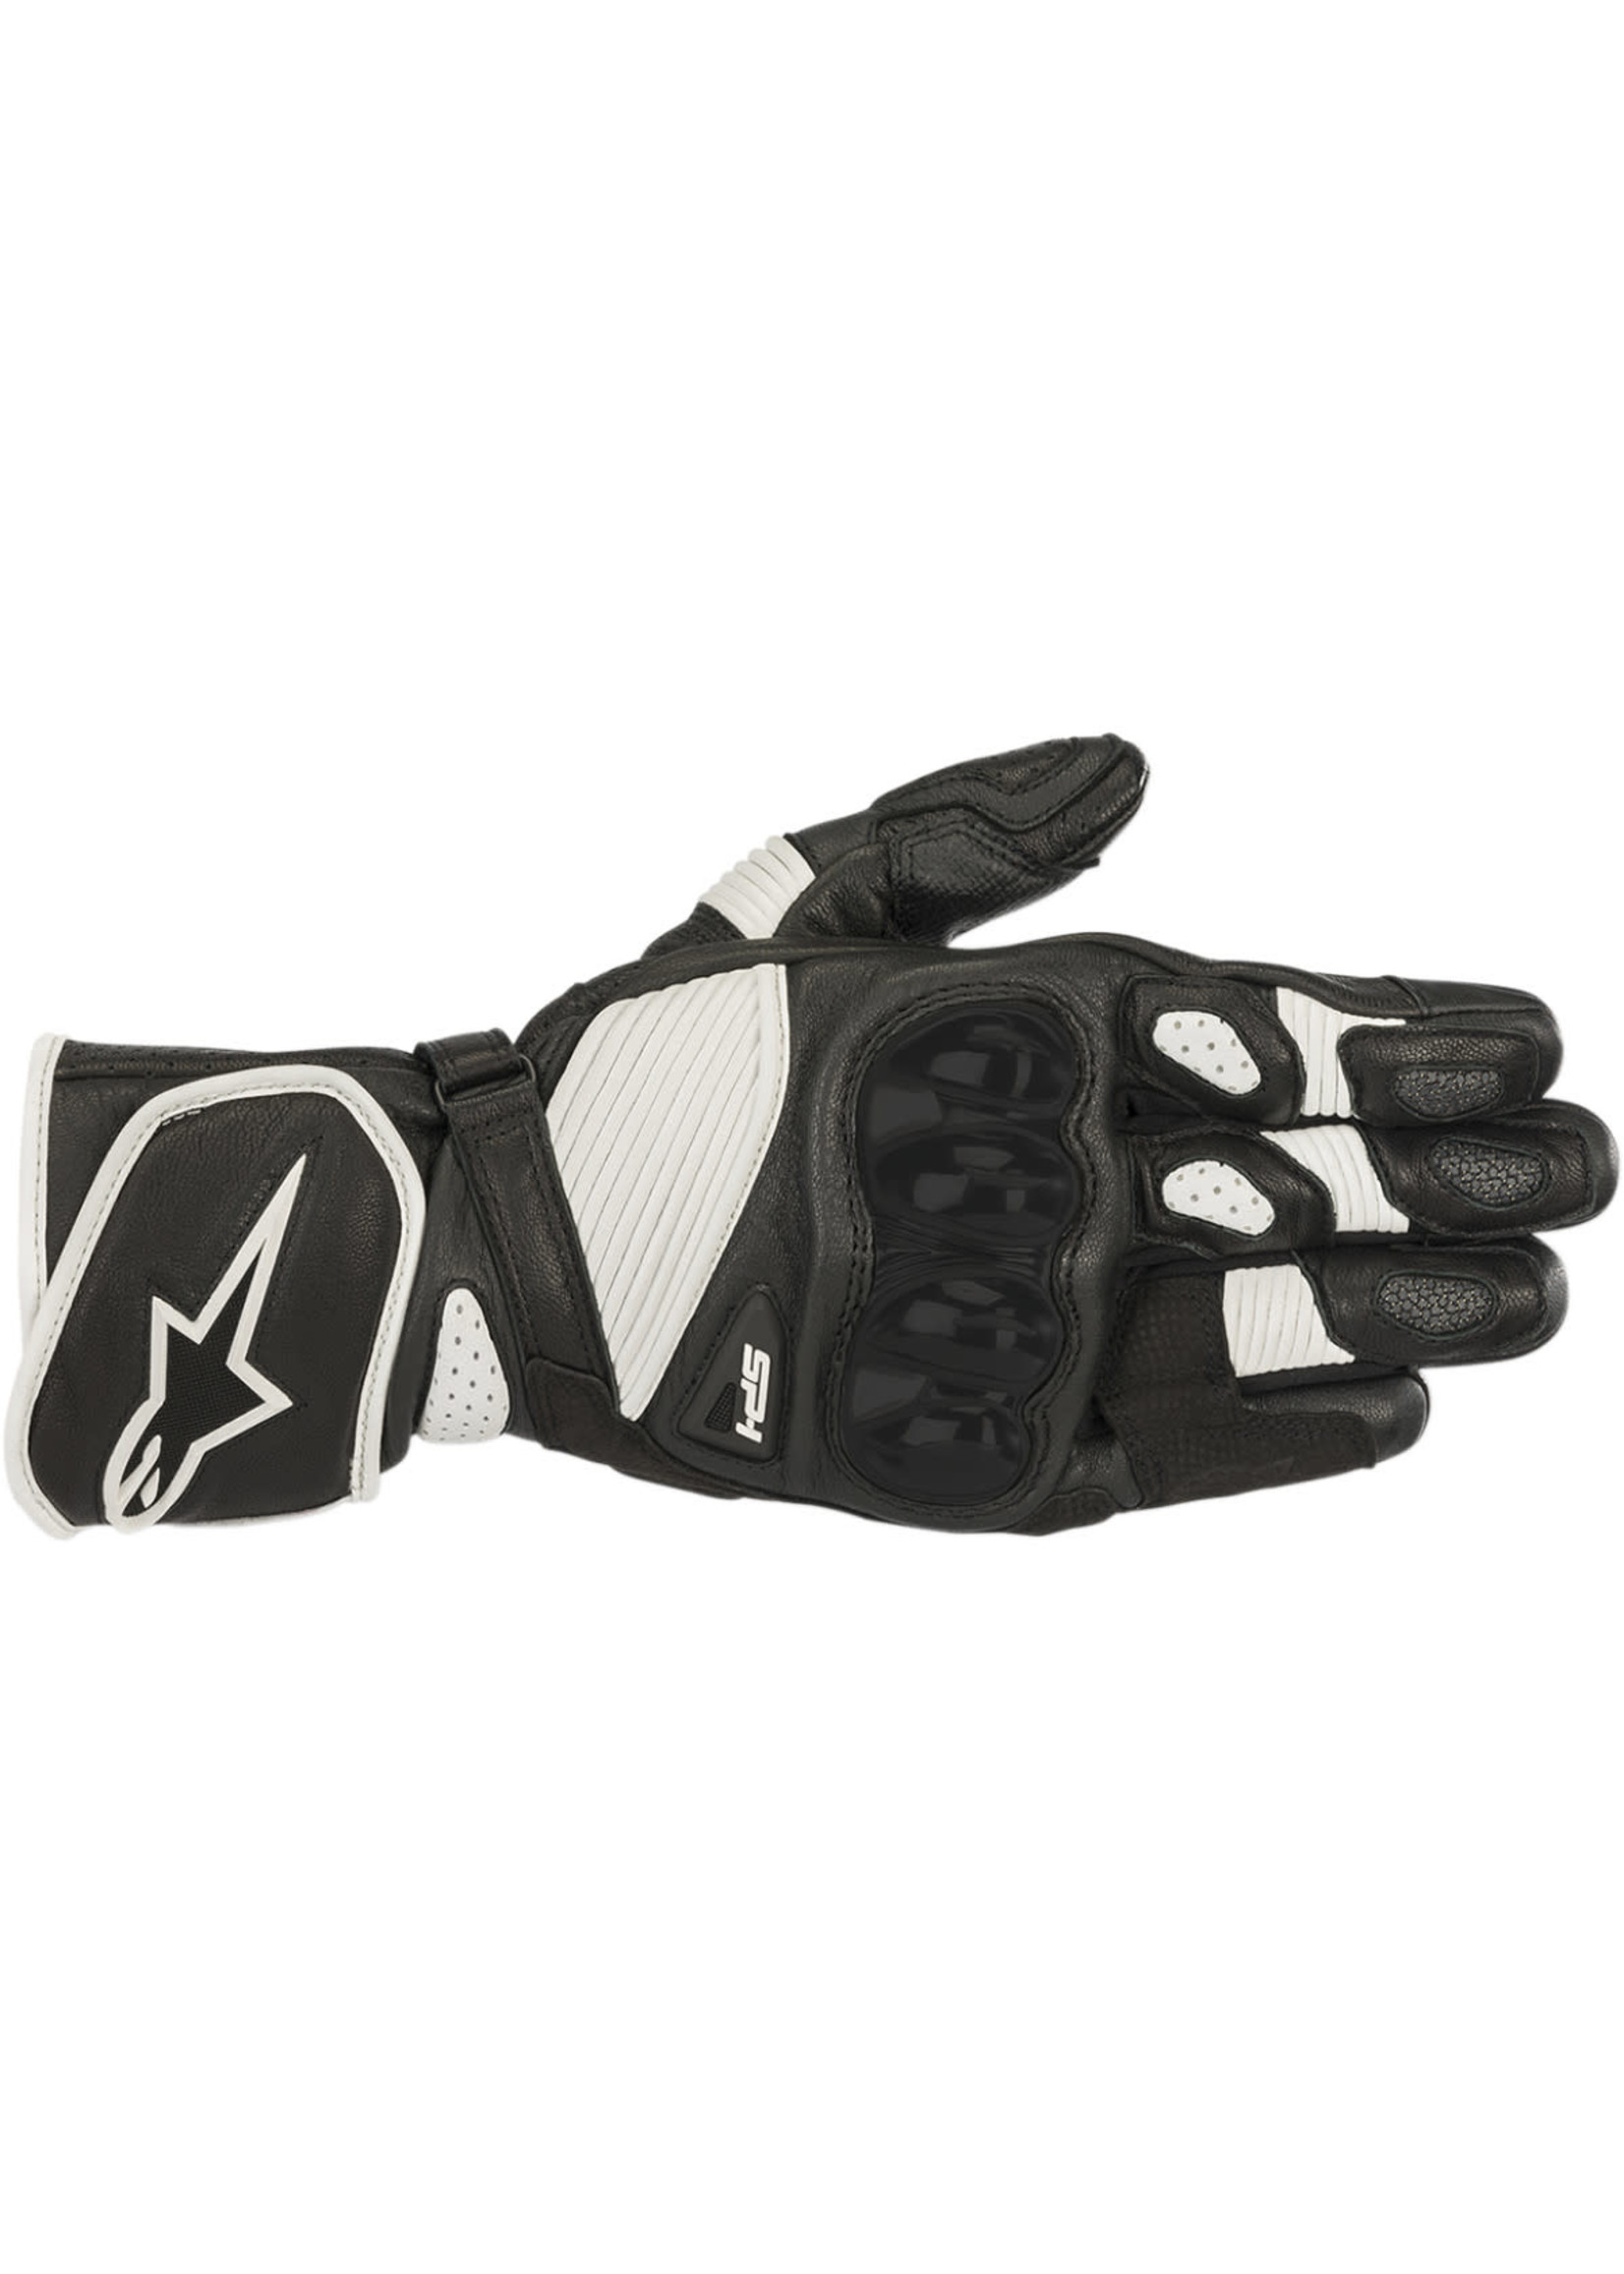 Alpinestars Alpinestars SP-1 Gloves B/W